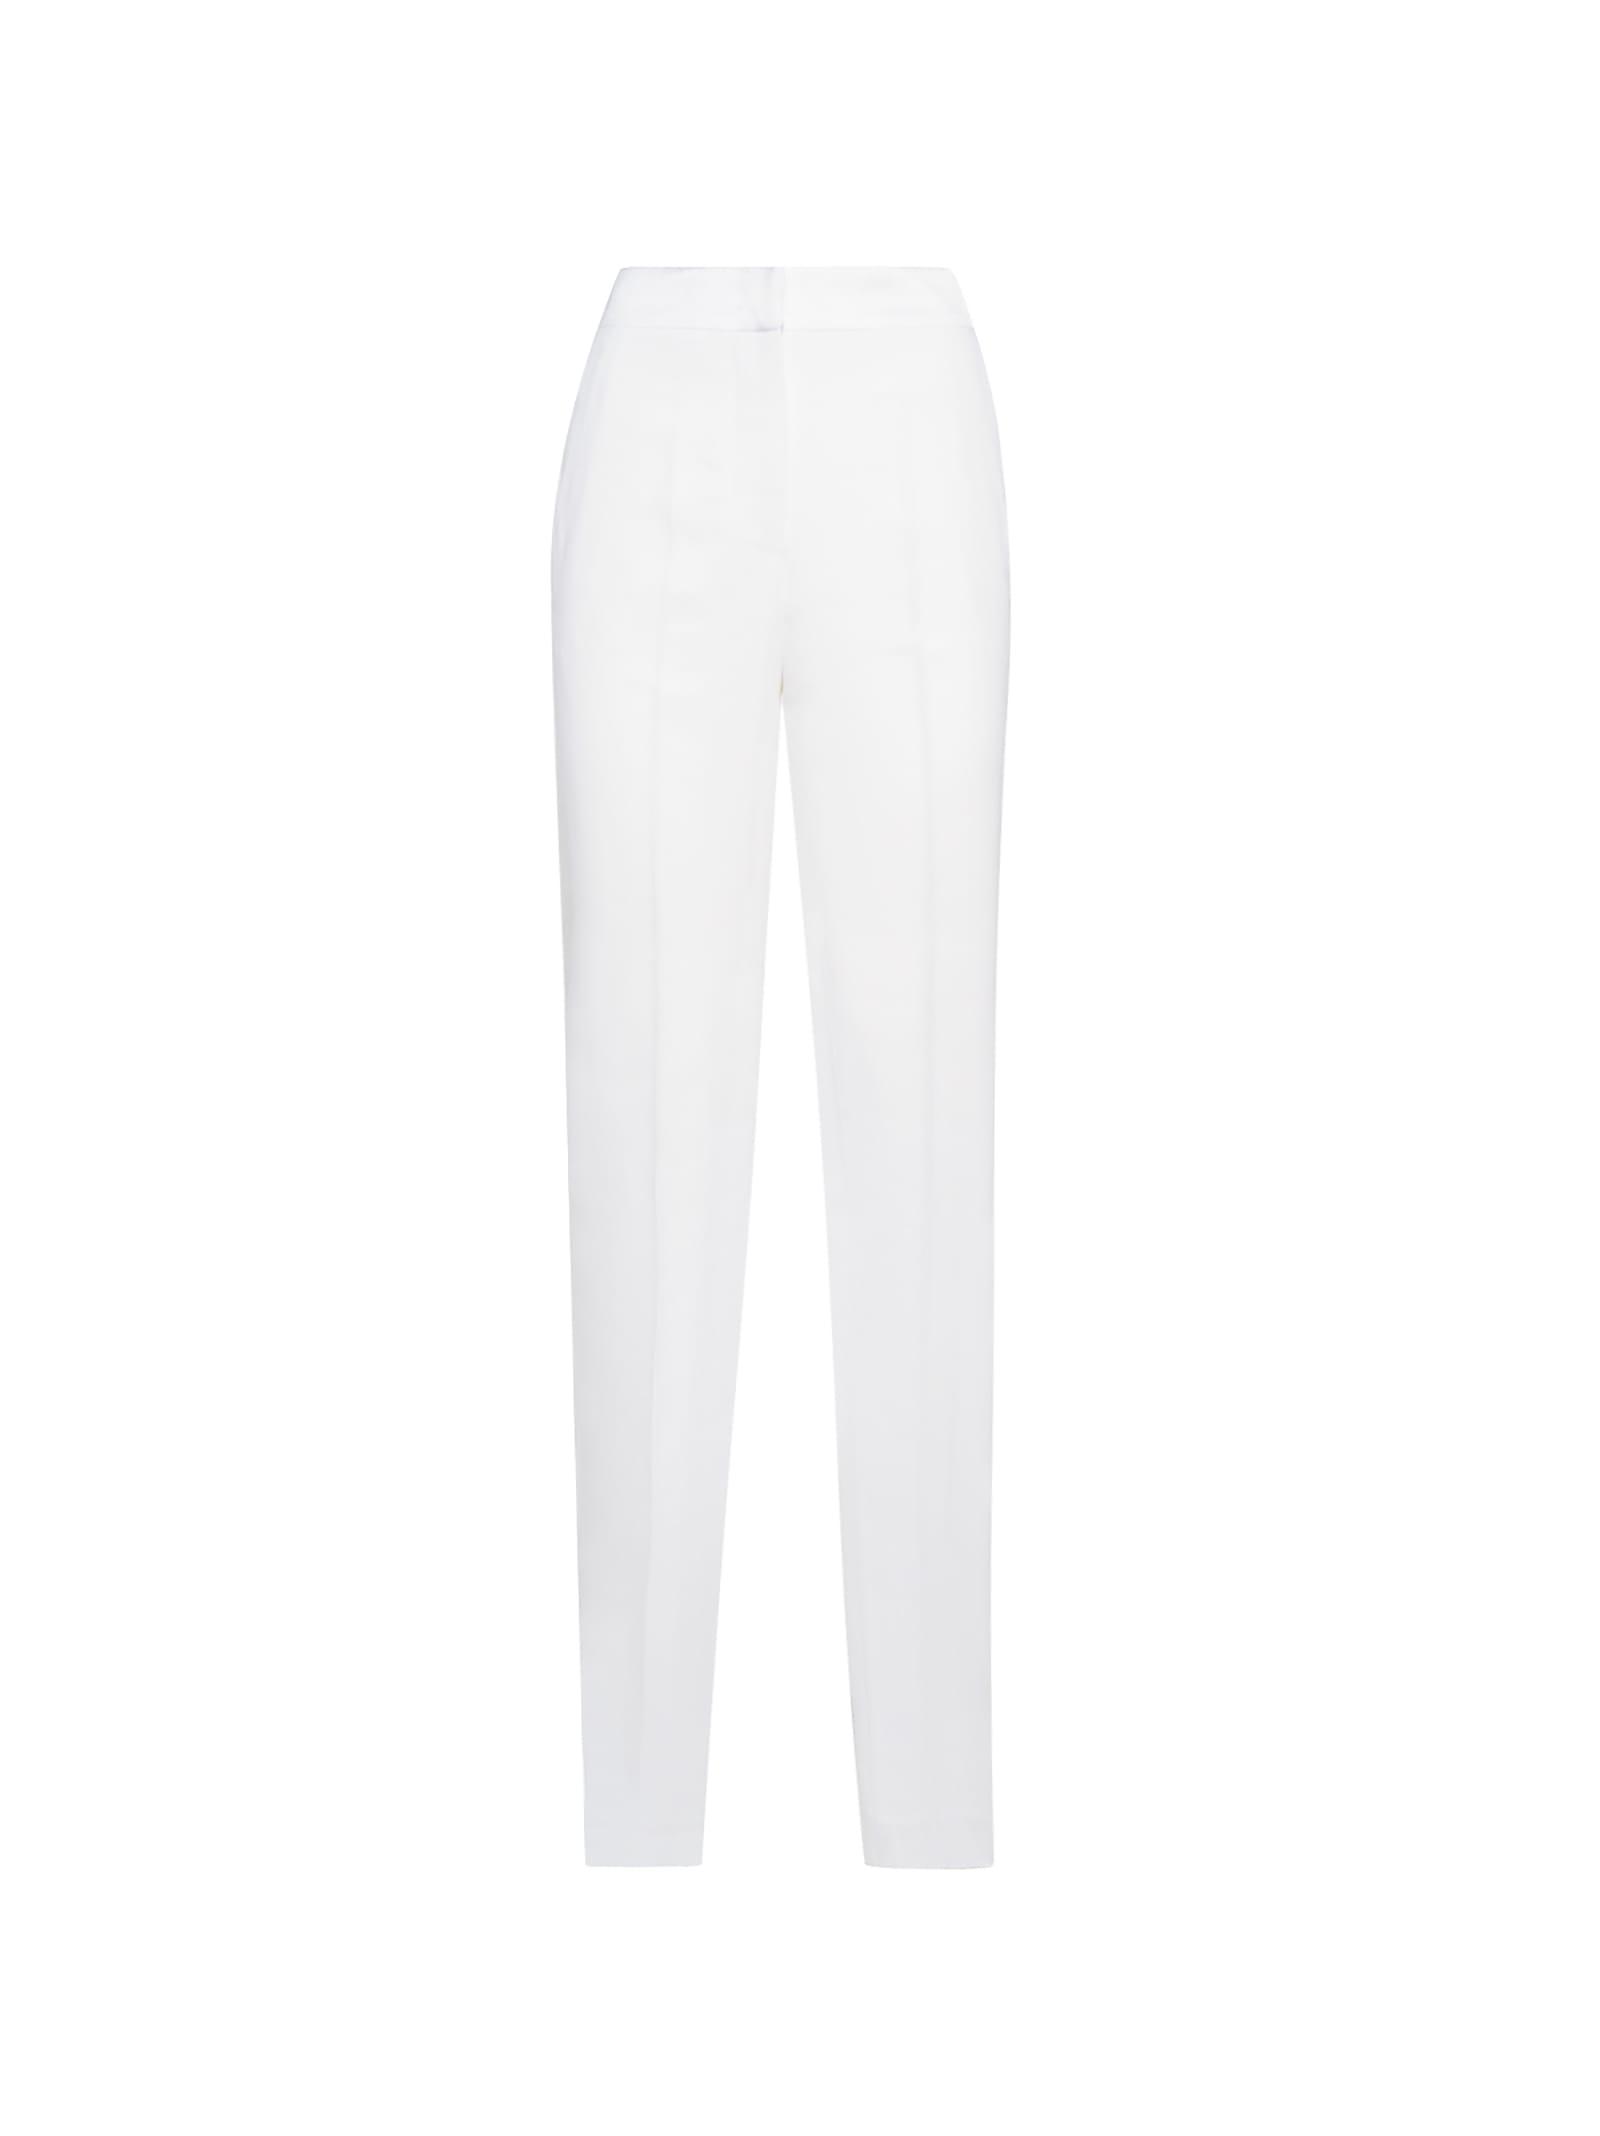 White Viscose Trousers